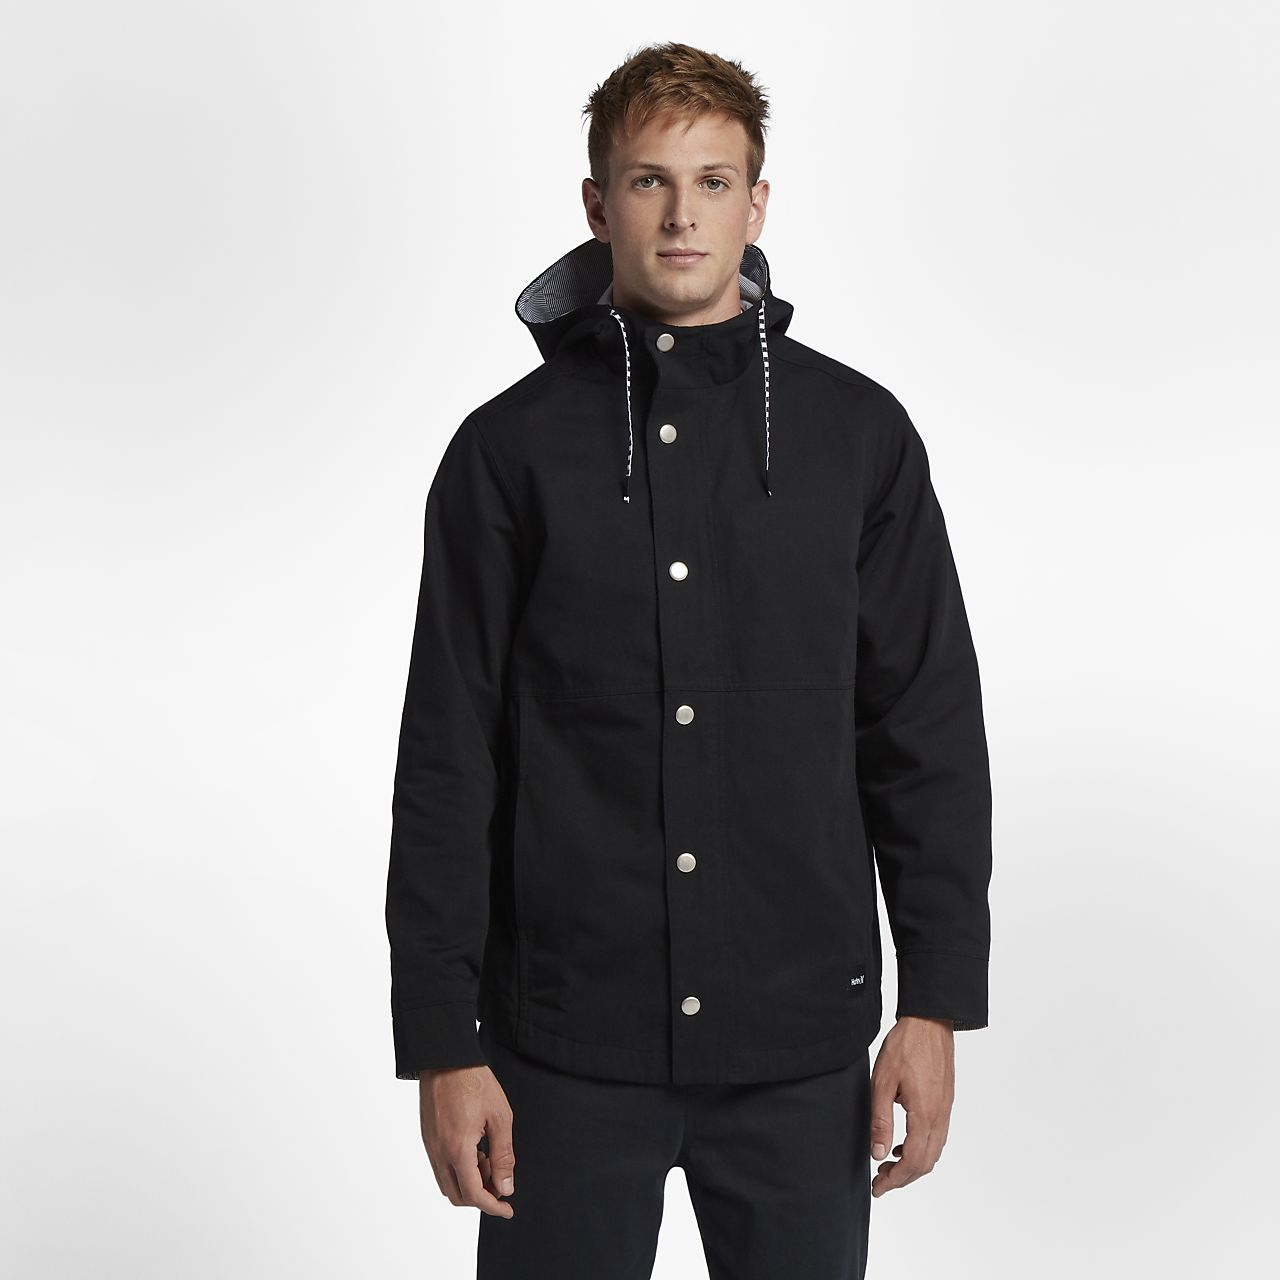 Hurley Mac A-Frame Men's Jacket